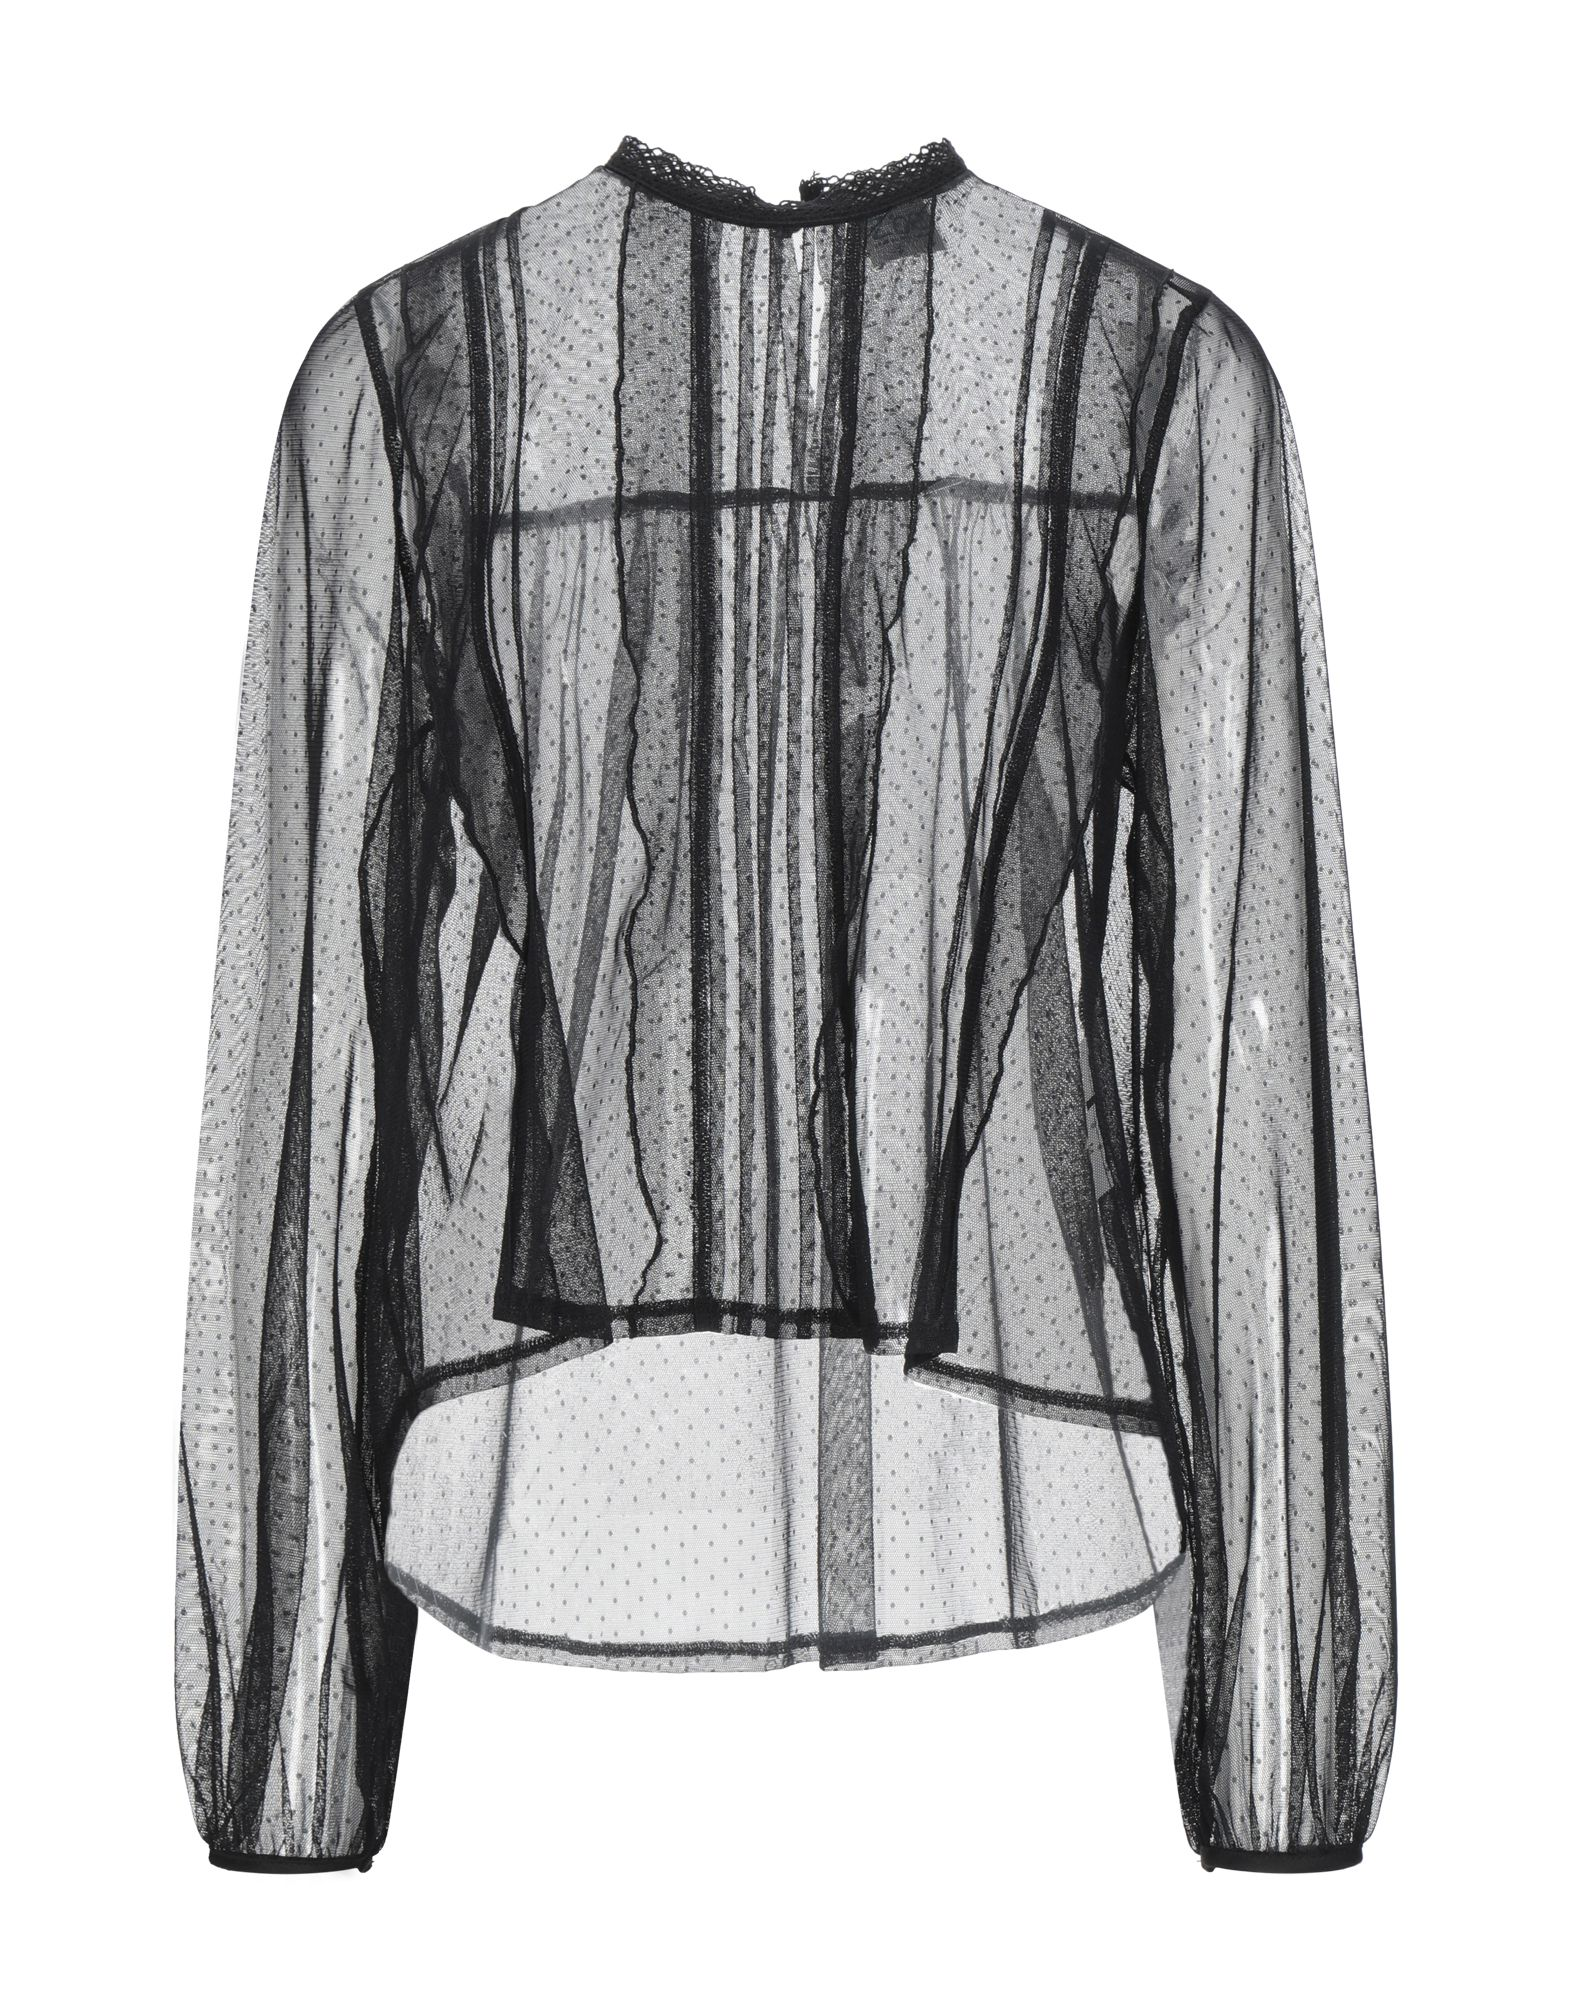 Z.O.E. ZONE OF EMBROIDERED Блузка z o e zone of embroidered свитер